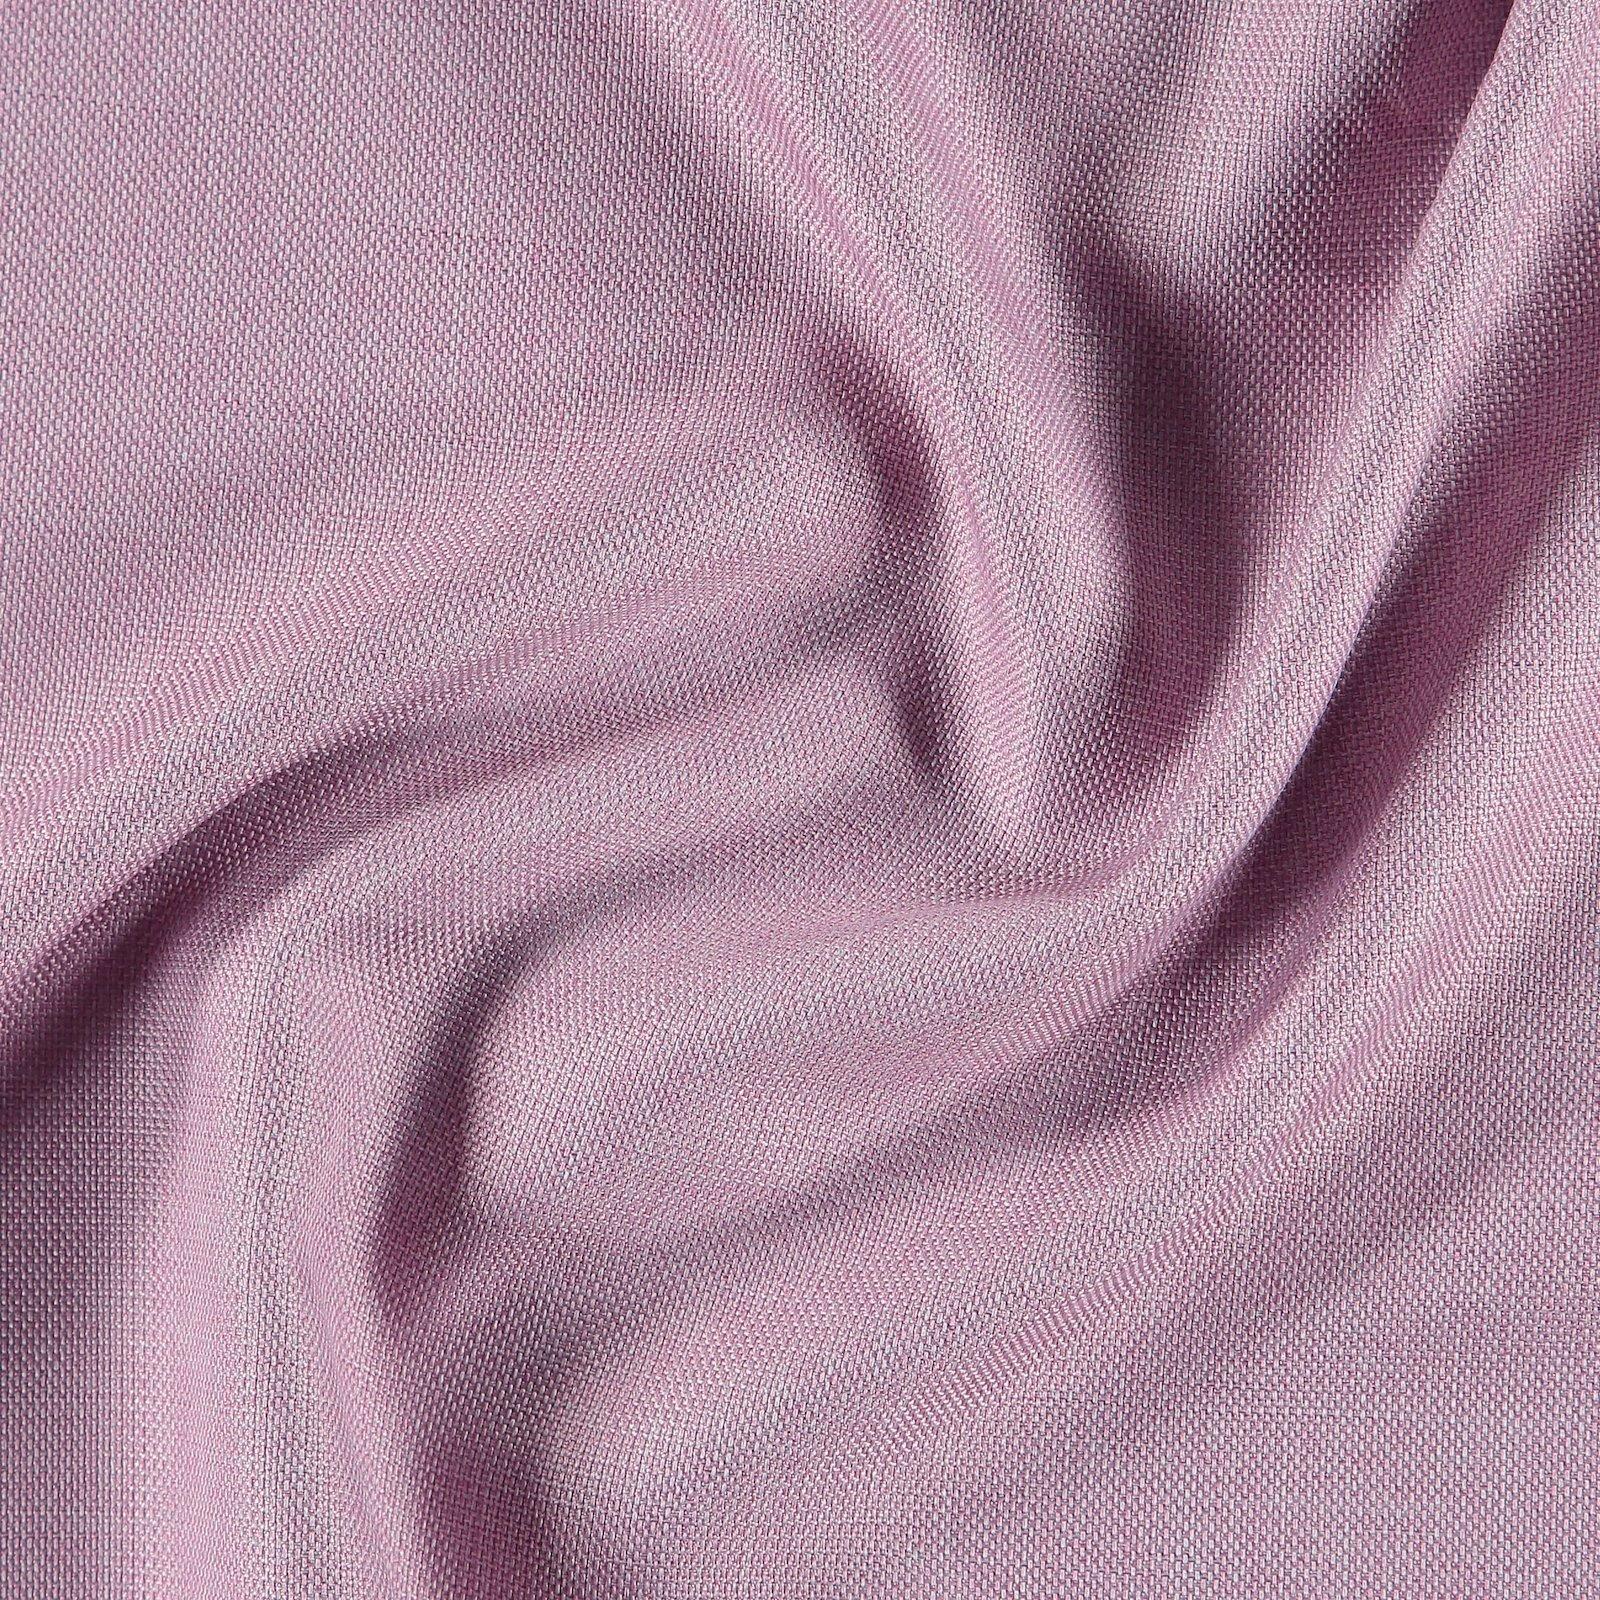 Upholstery fabric dusty violet melange 824164_pack